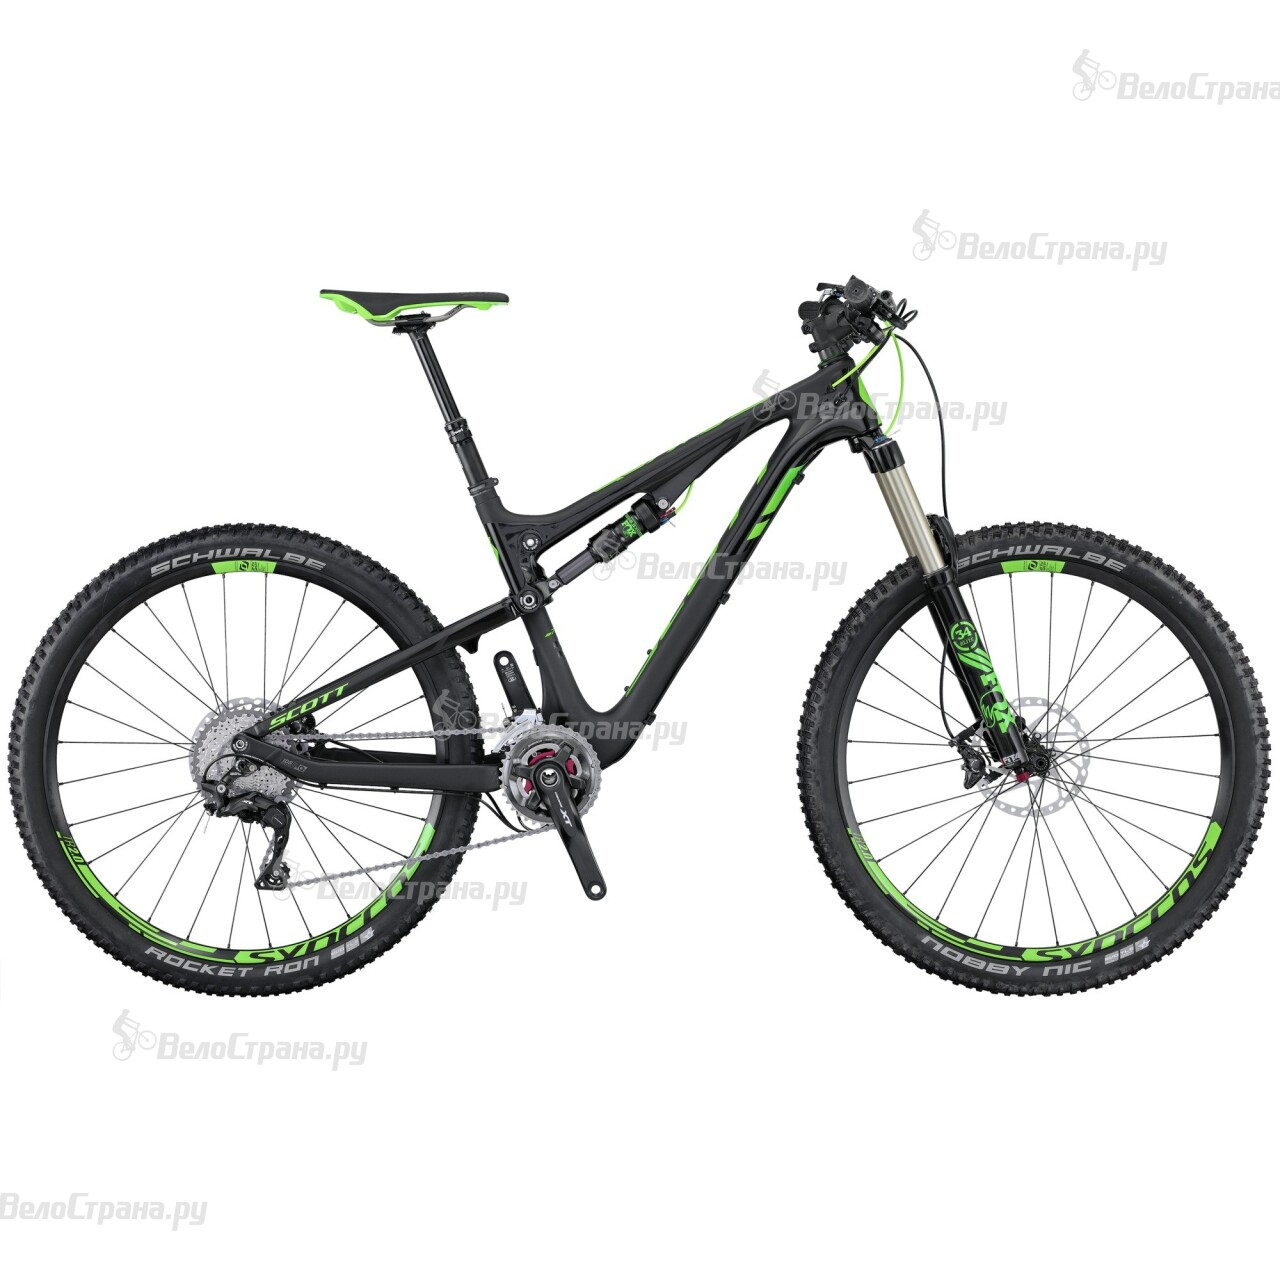 Велосипед Scott Genius 910 (2016) велосипед scott genius lt 700 tuned plus 2016